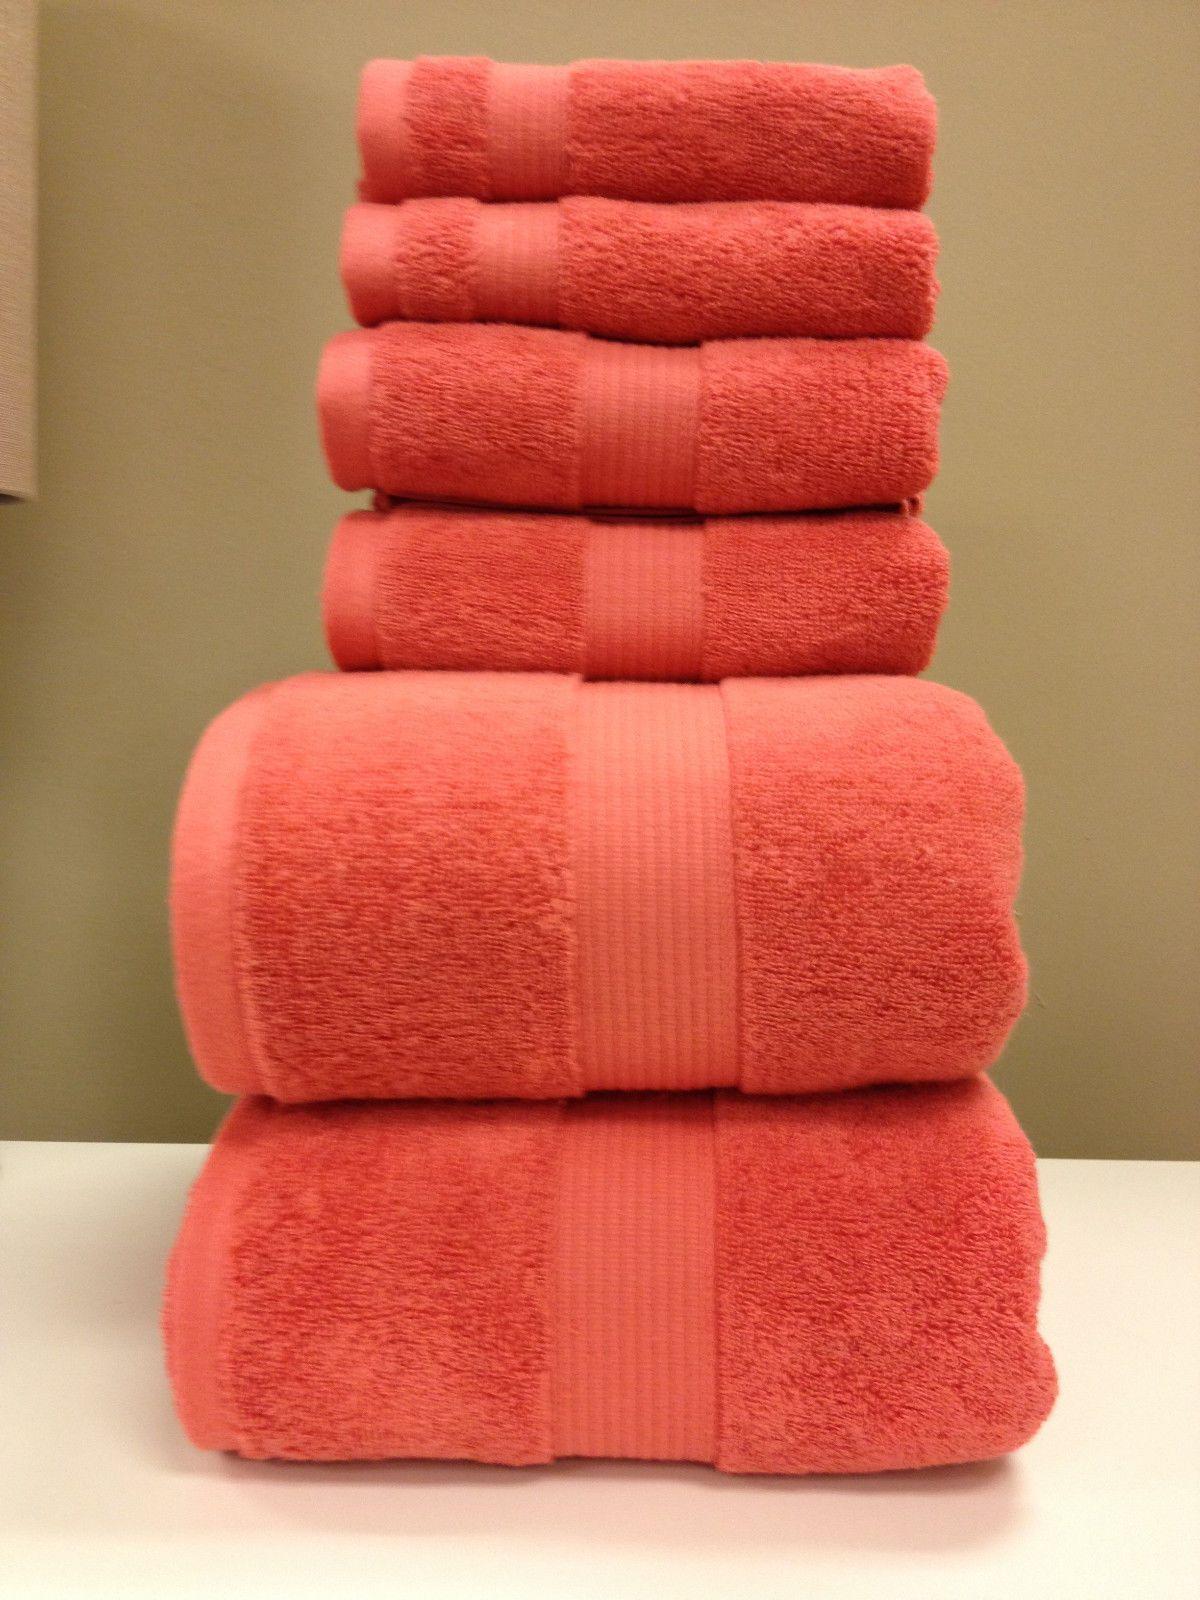 Best Of orange towels Walmart